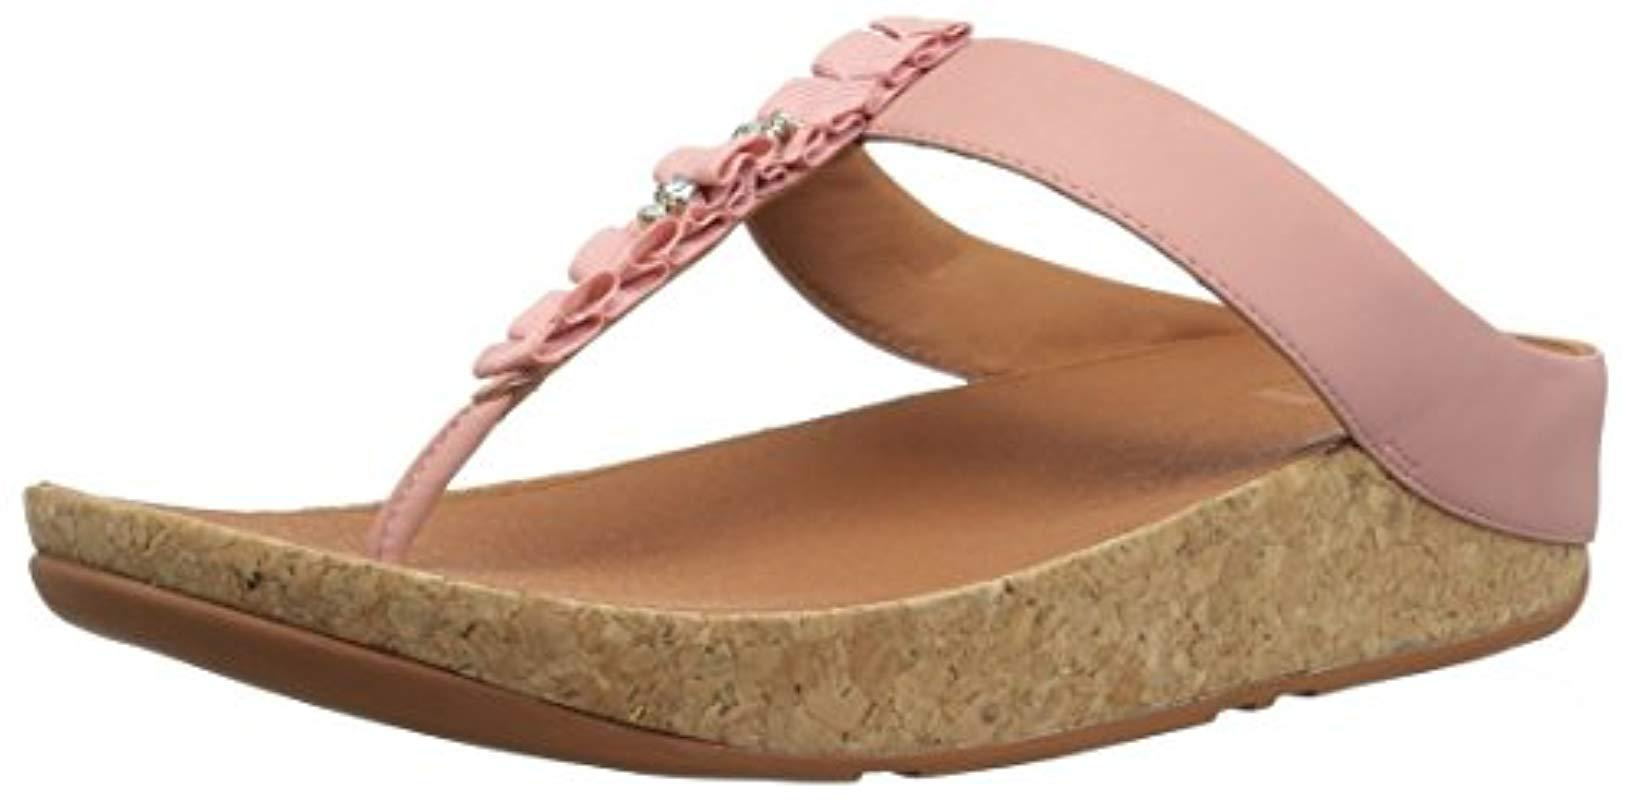 73e1b4da7802aa Lyst - Fitflop Ruffle Toe-thong Sandal in Pink - Save 24%